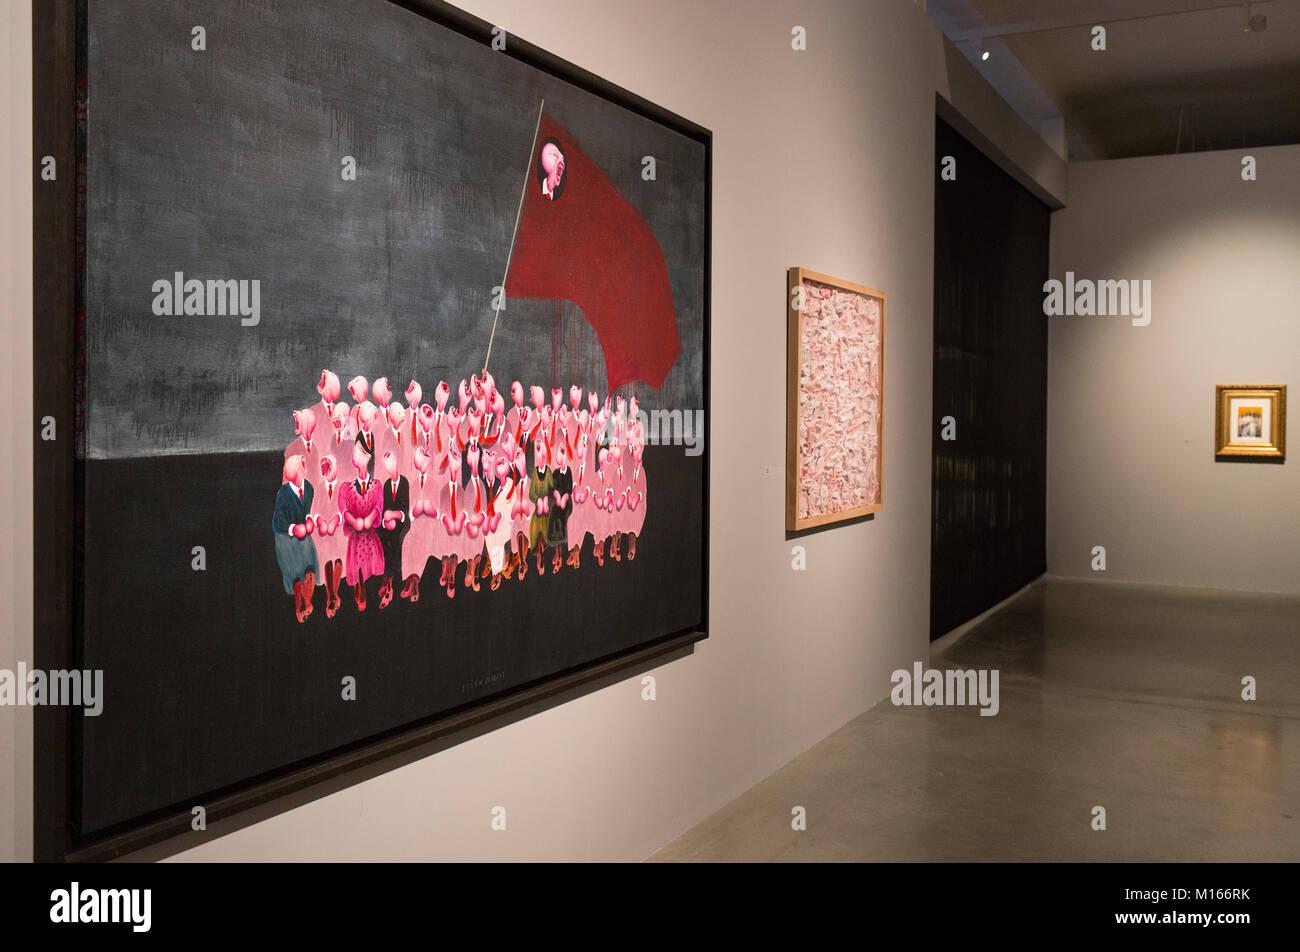 Pulse vista previa determinación de la exposición de arte de artista multimedia Daniel Pesta a Centro de Arte Contemporáneo Foto de stock